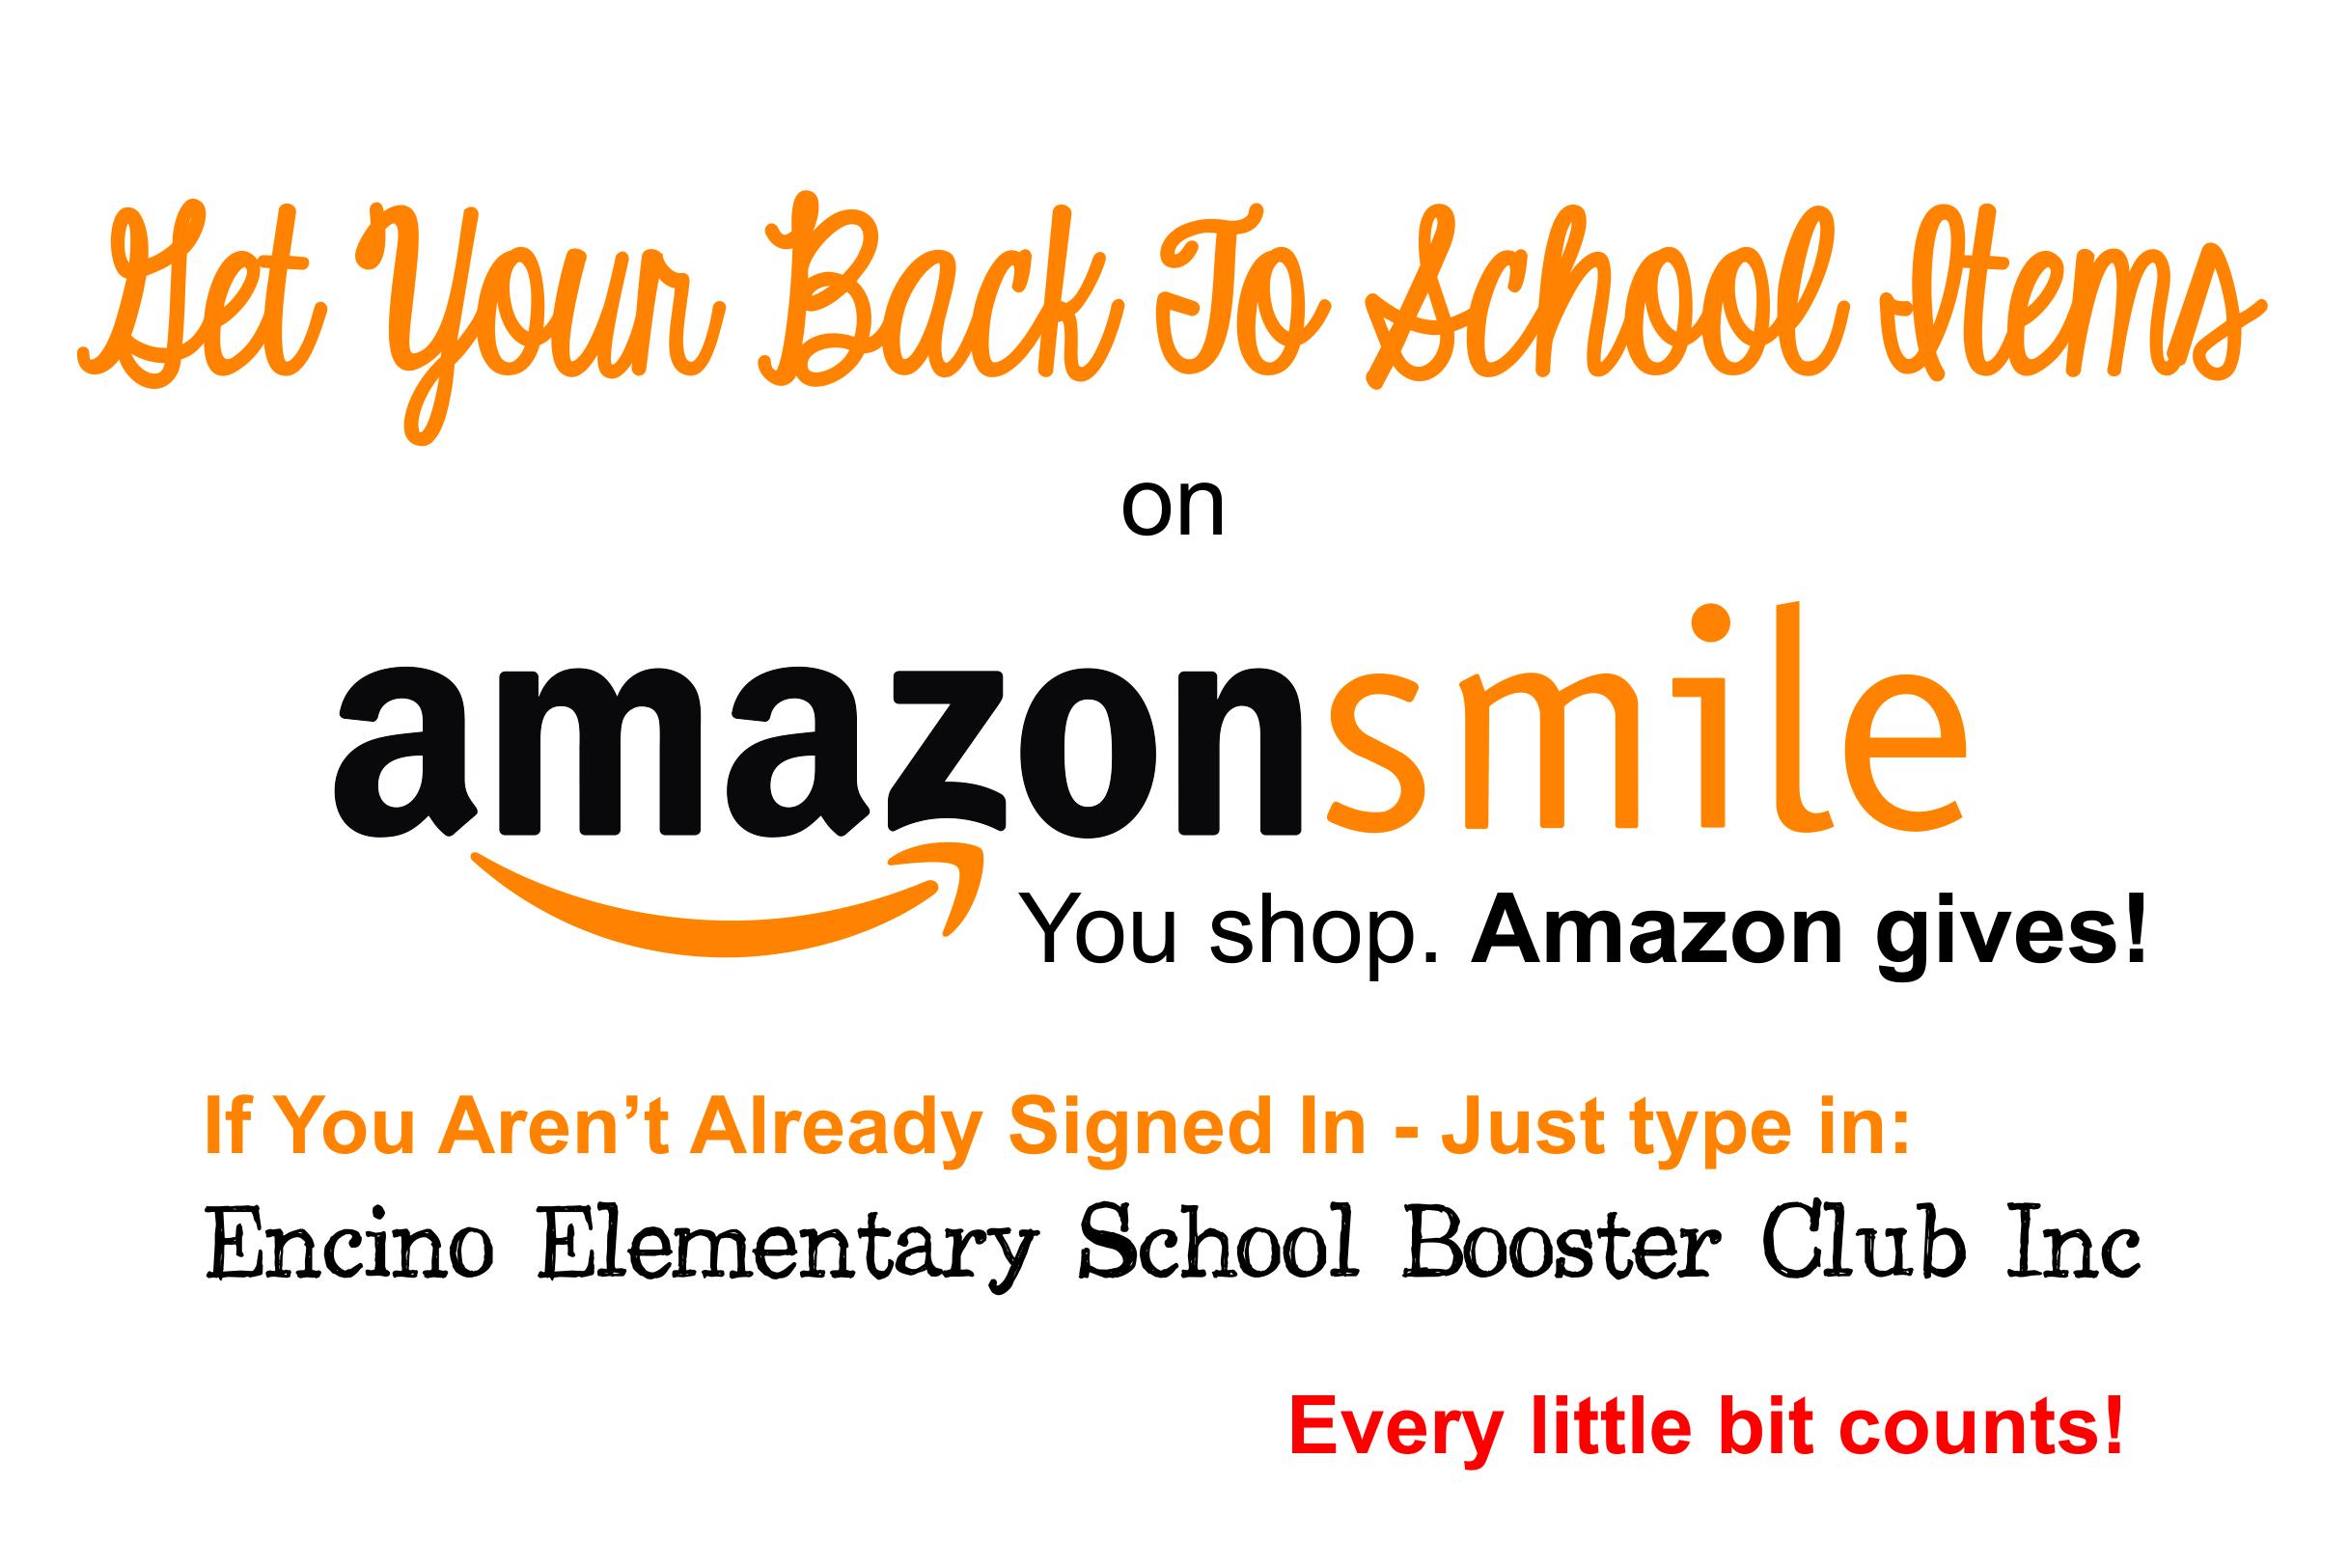 Contribute to ECES through Amazon!